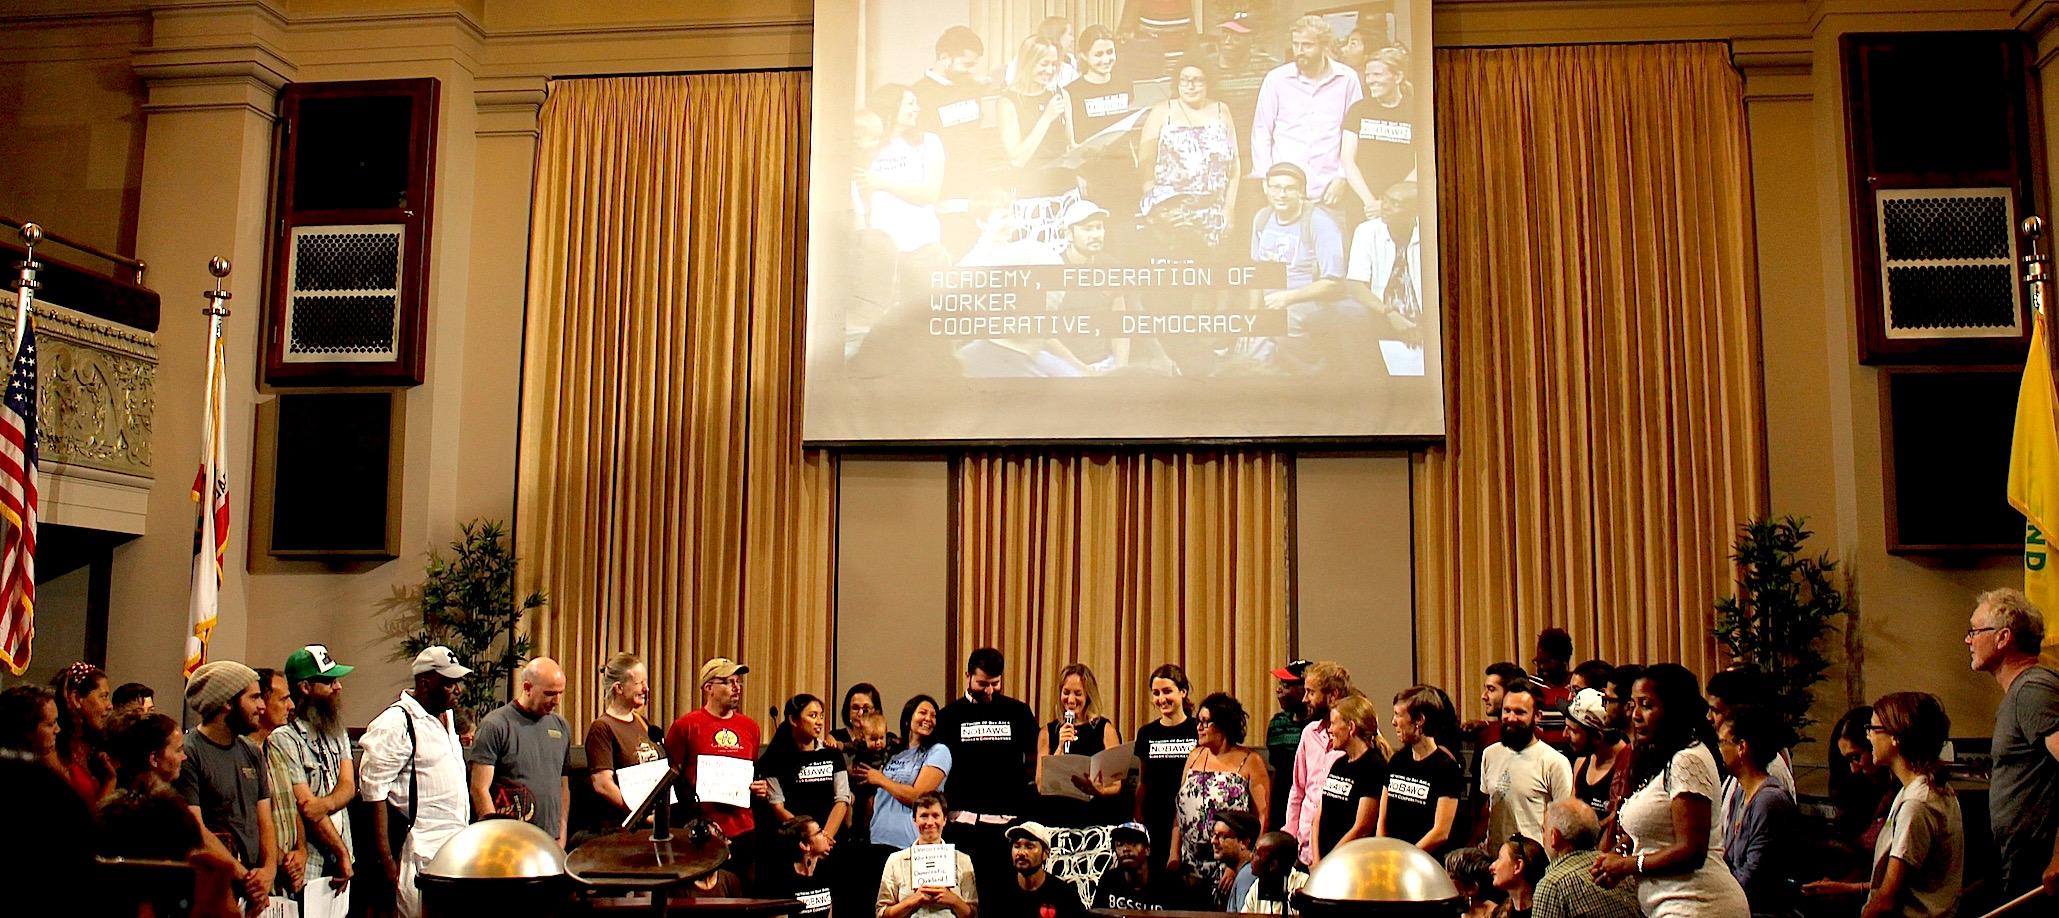 CM Campbell Washington Reads Oakland Worker Cooperative Resolution 9_8_15.jpg